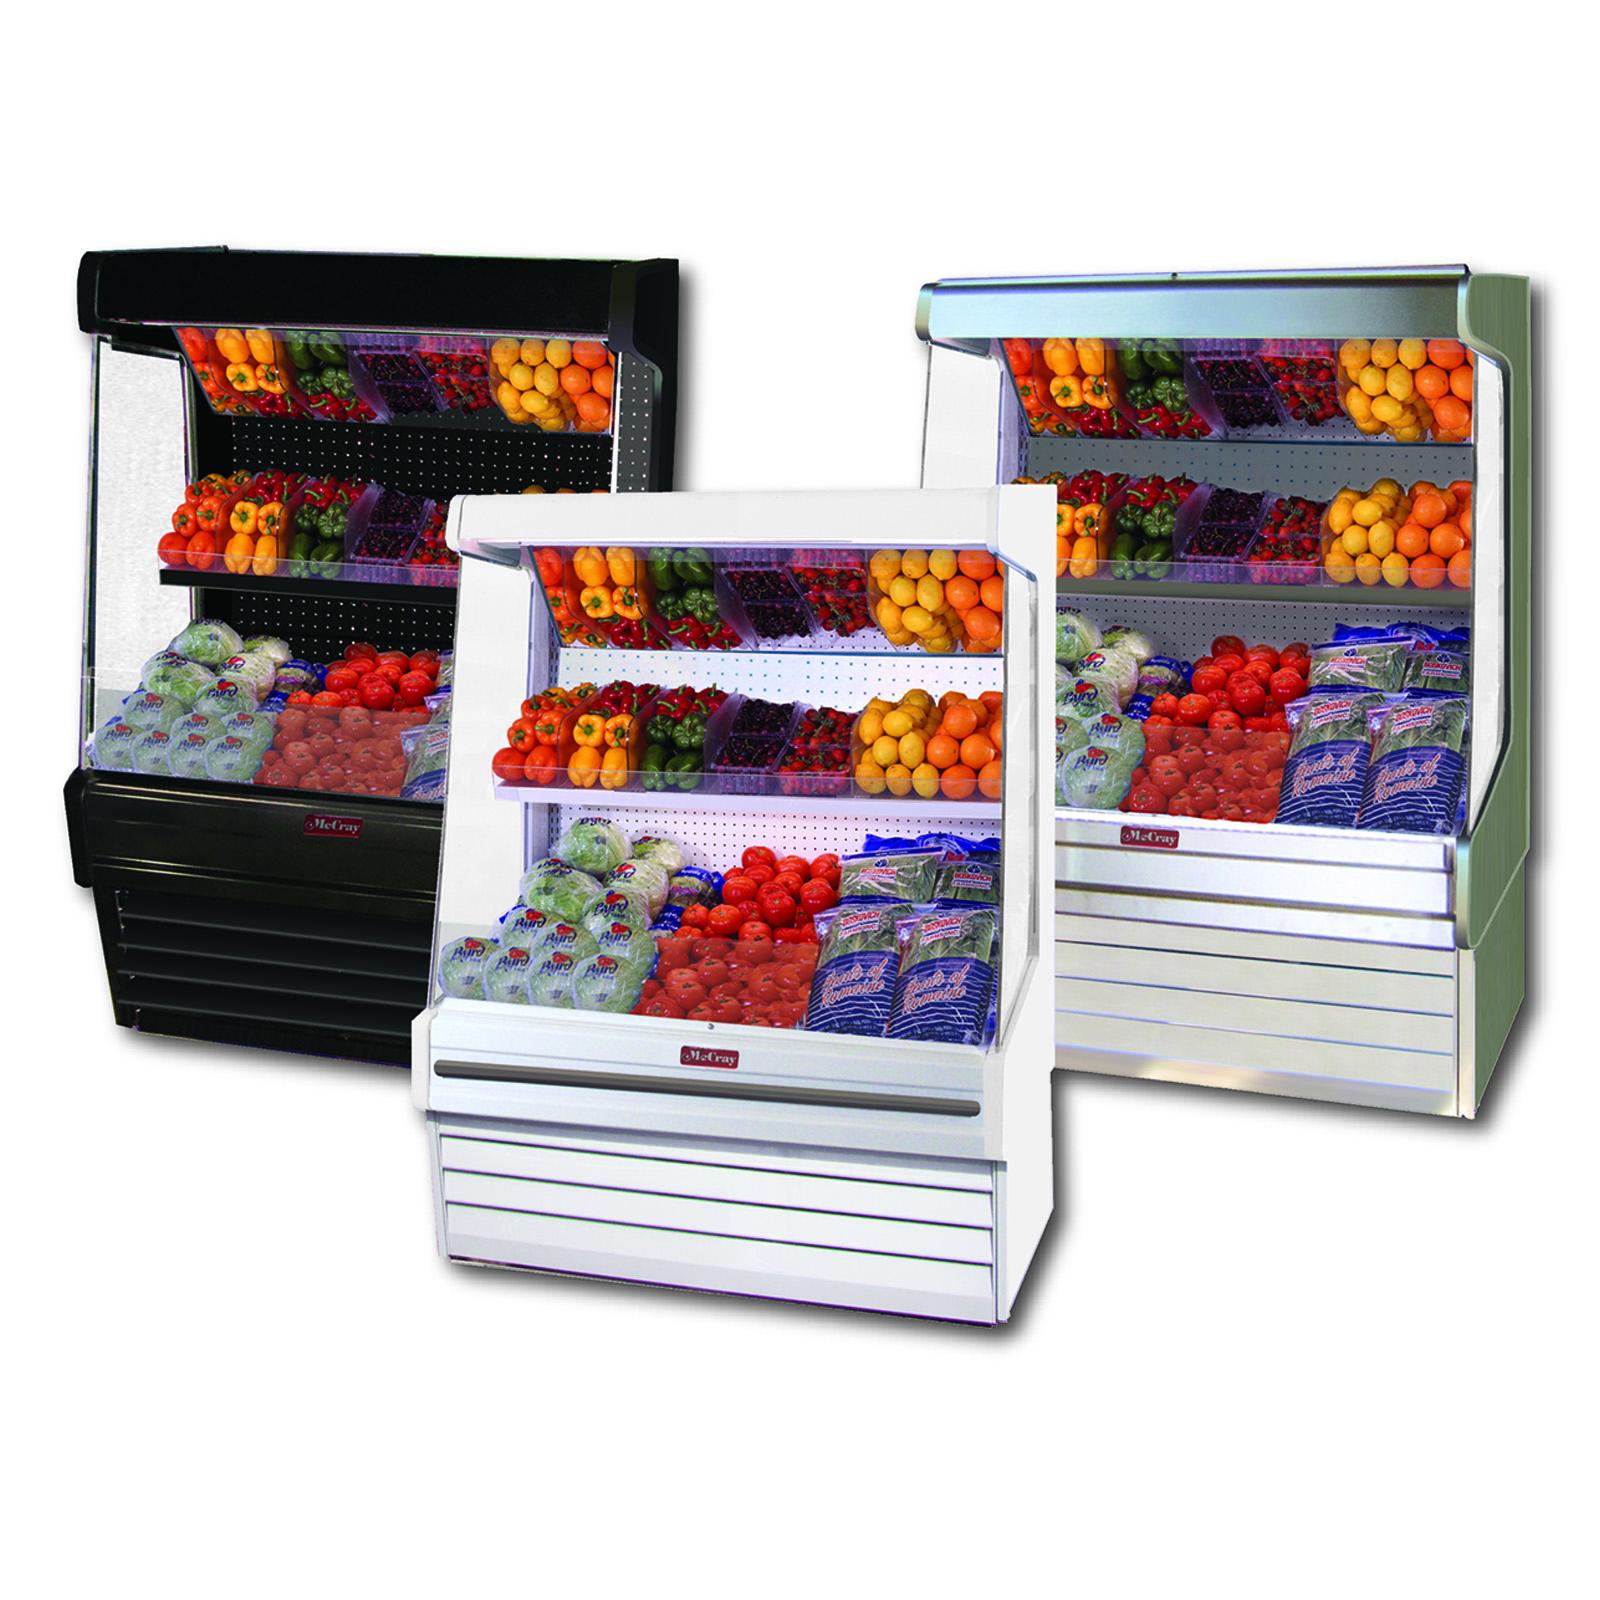 Howard-McCray SC-OP30E-5-B-LED display case, produce